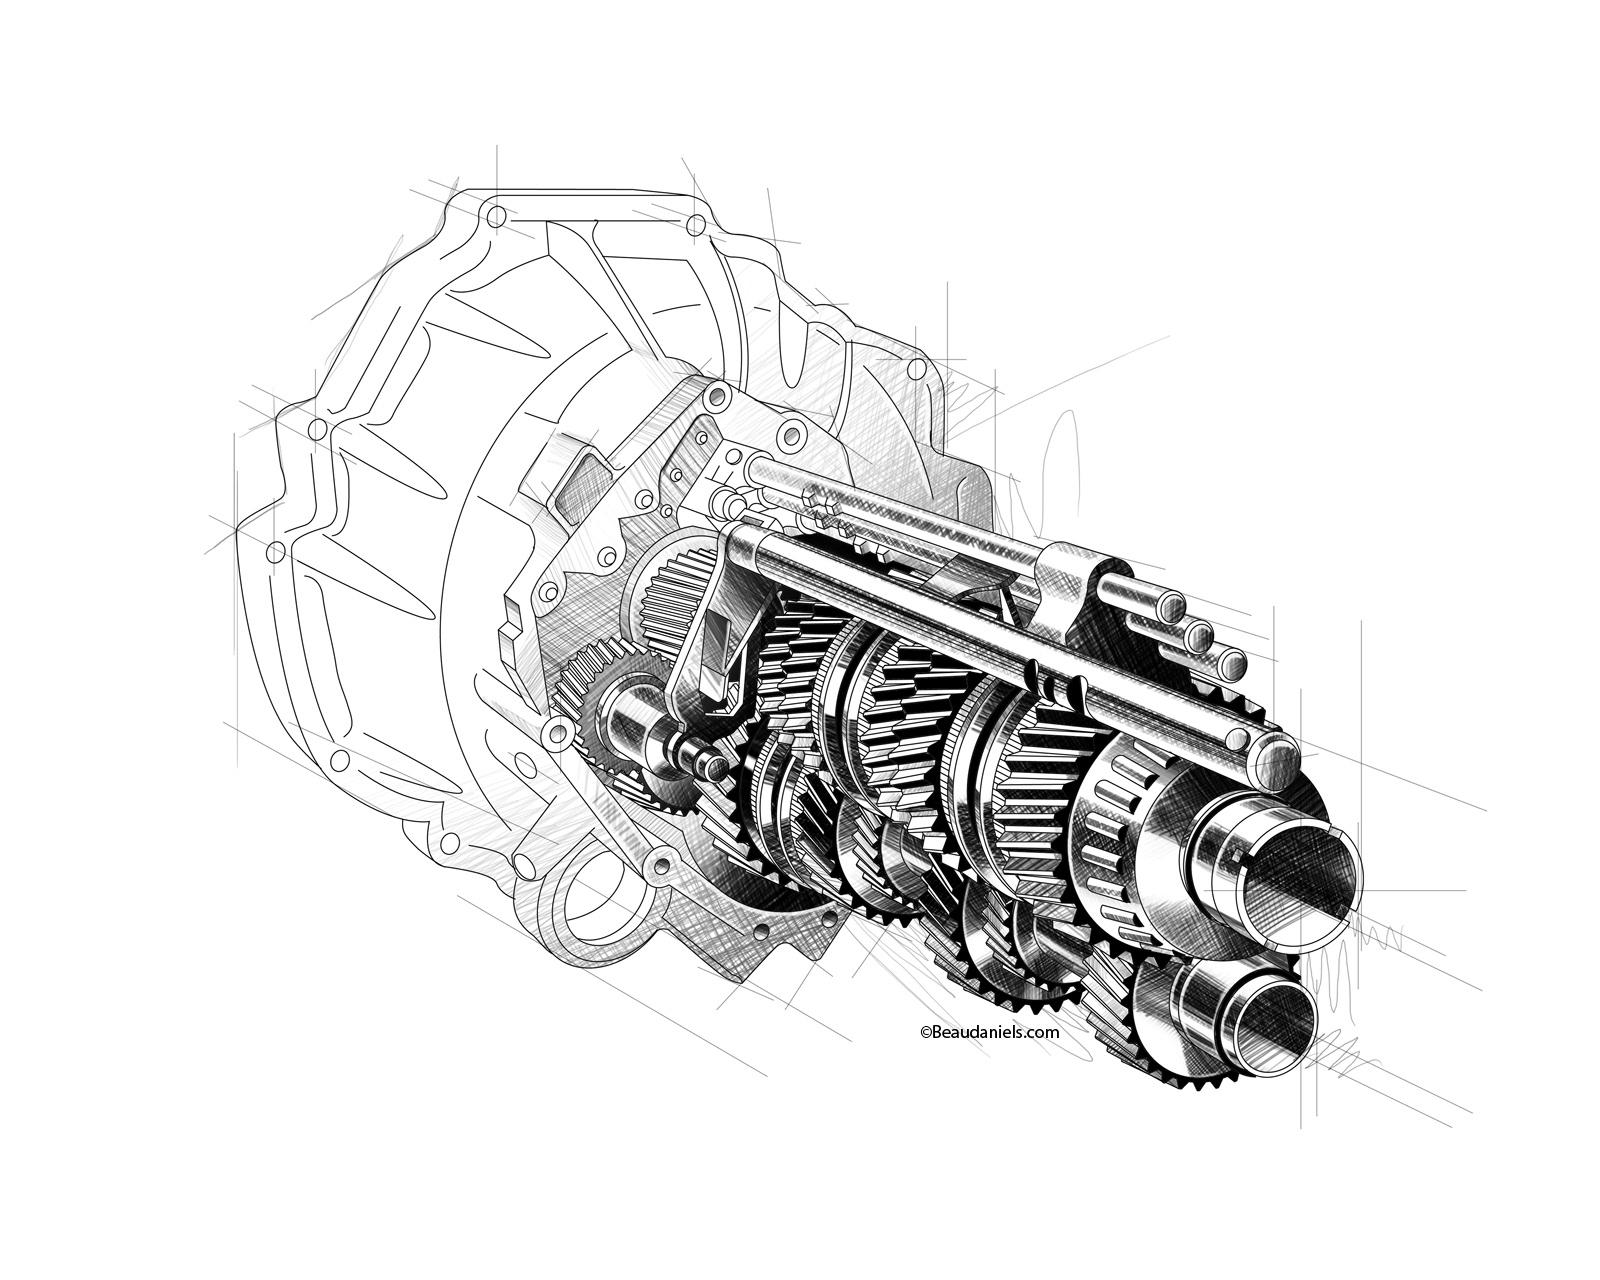 technical illustration  beau and alan daniels